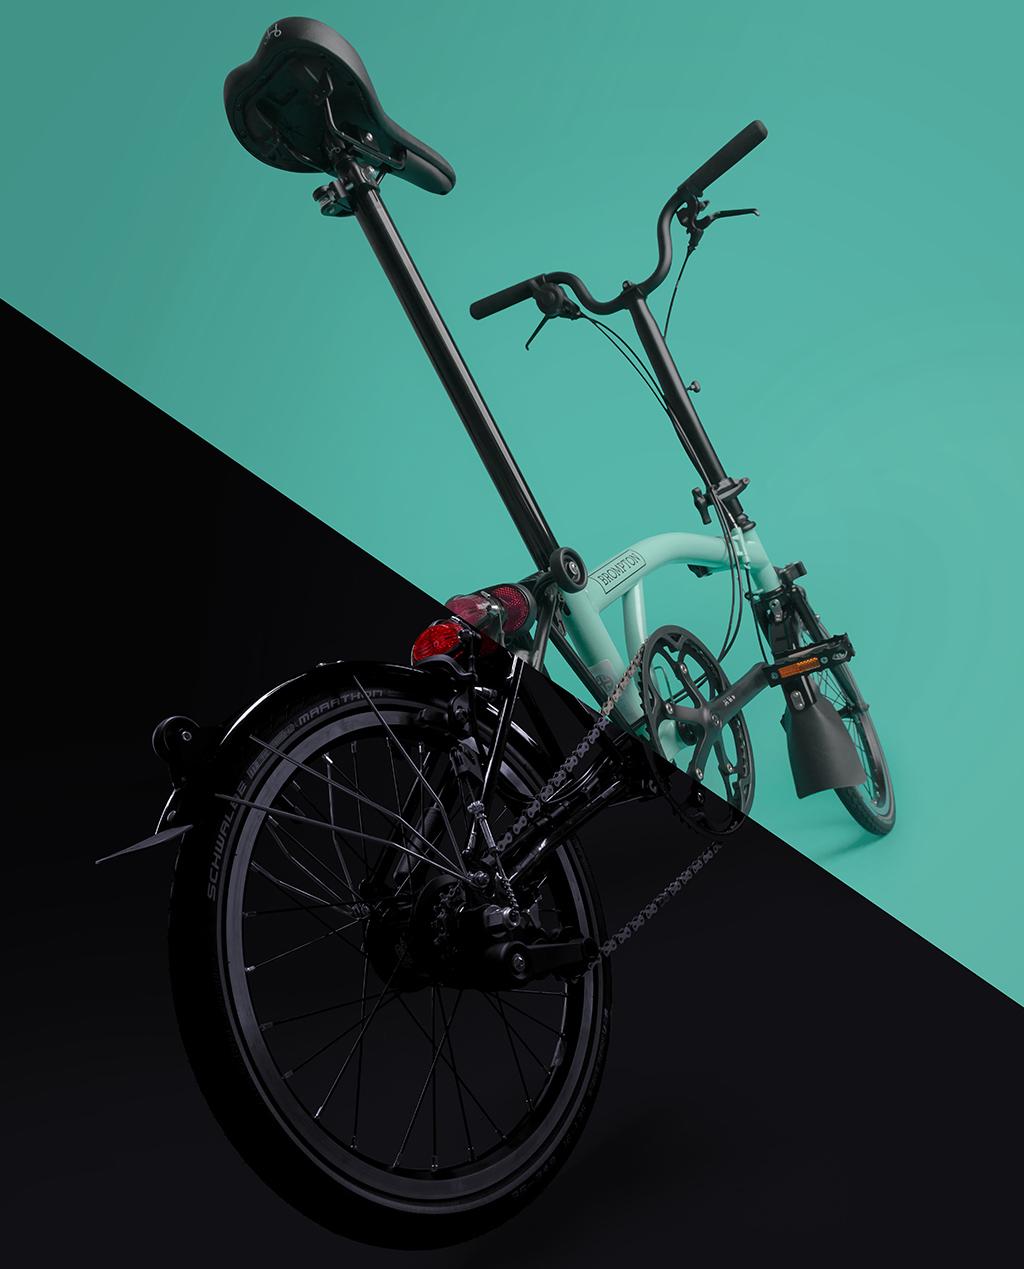 A vendre M6L Turkish Green Black Edition 2018 avec roulettes Rider [VENDU] Brompt20